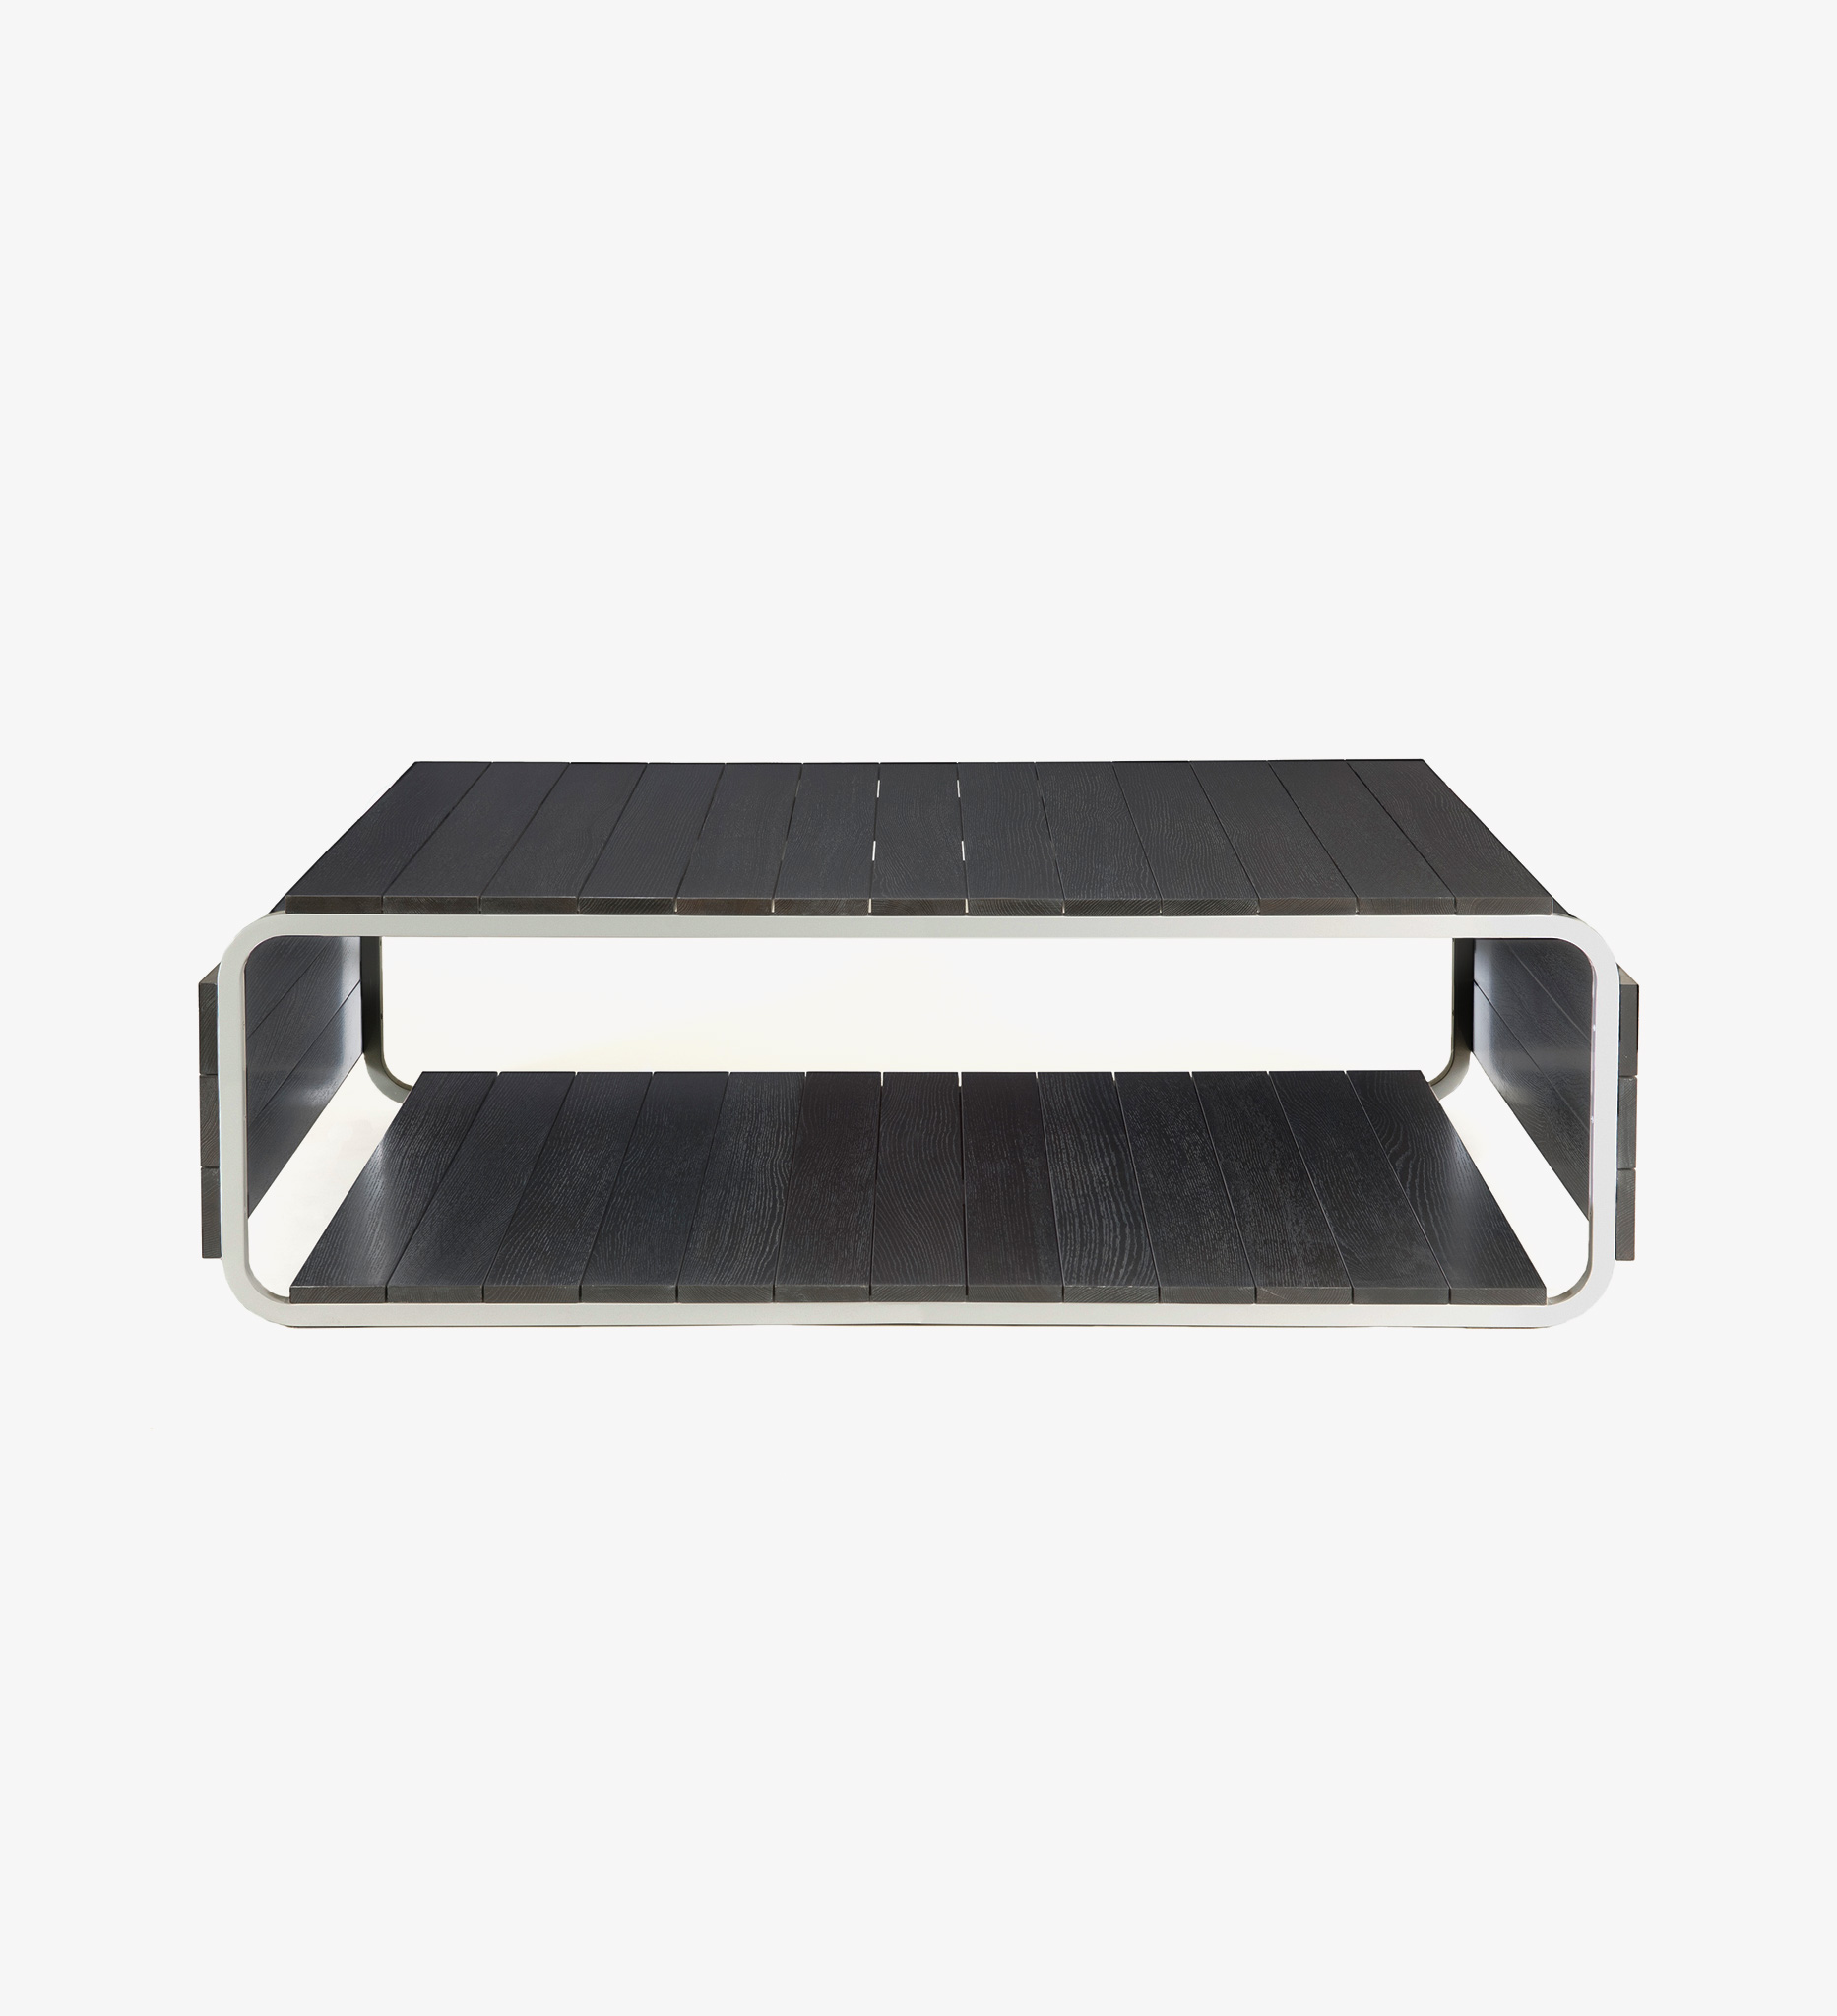 table, oak, Oak, Steel, Gray, White, wood, neutral, natural, ladera